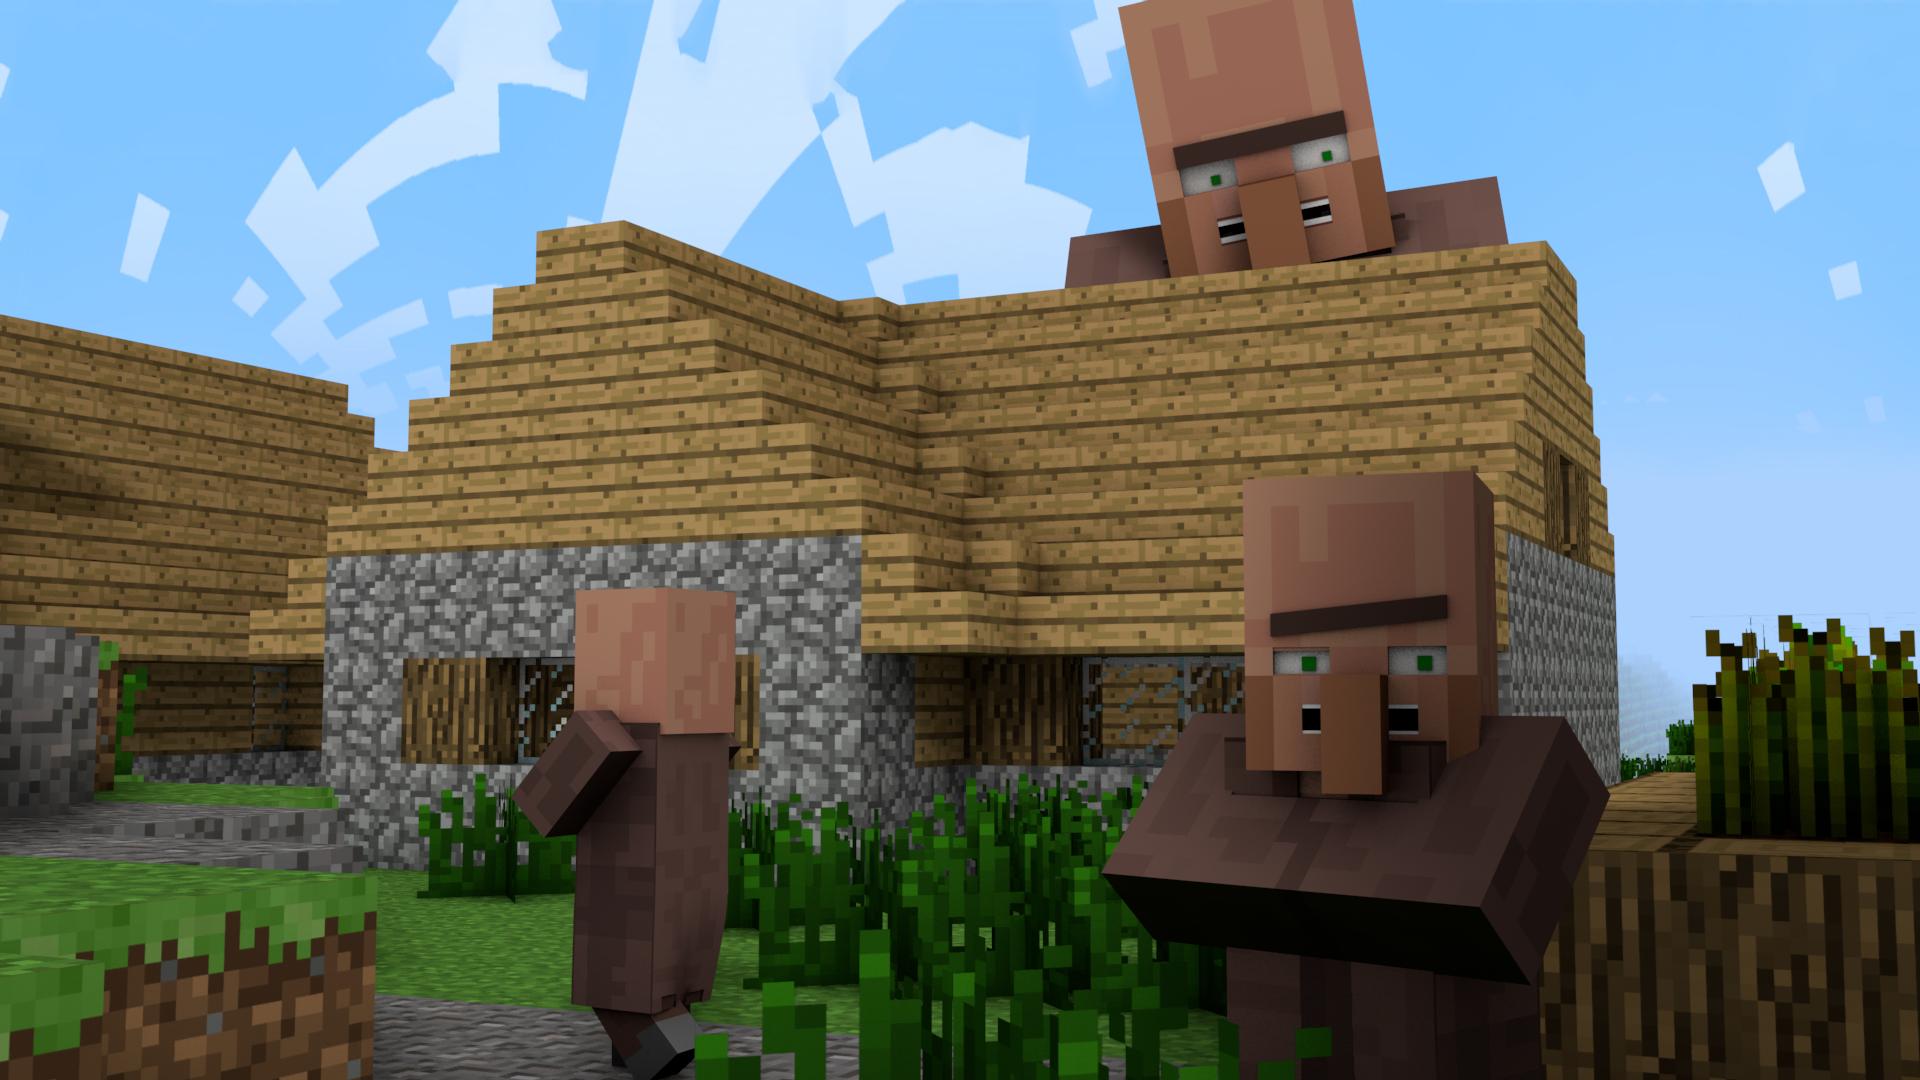 Minecraft Real Life Villager Minecraft - c4d - villageby